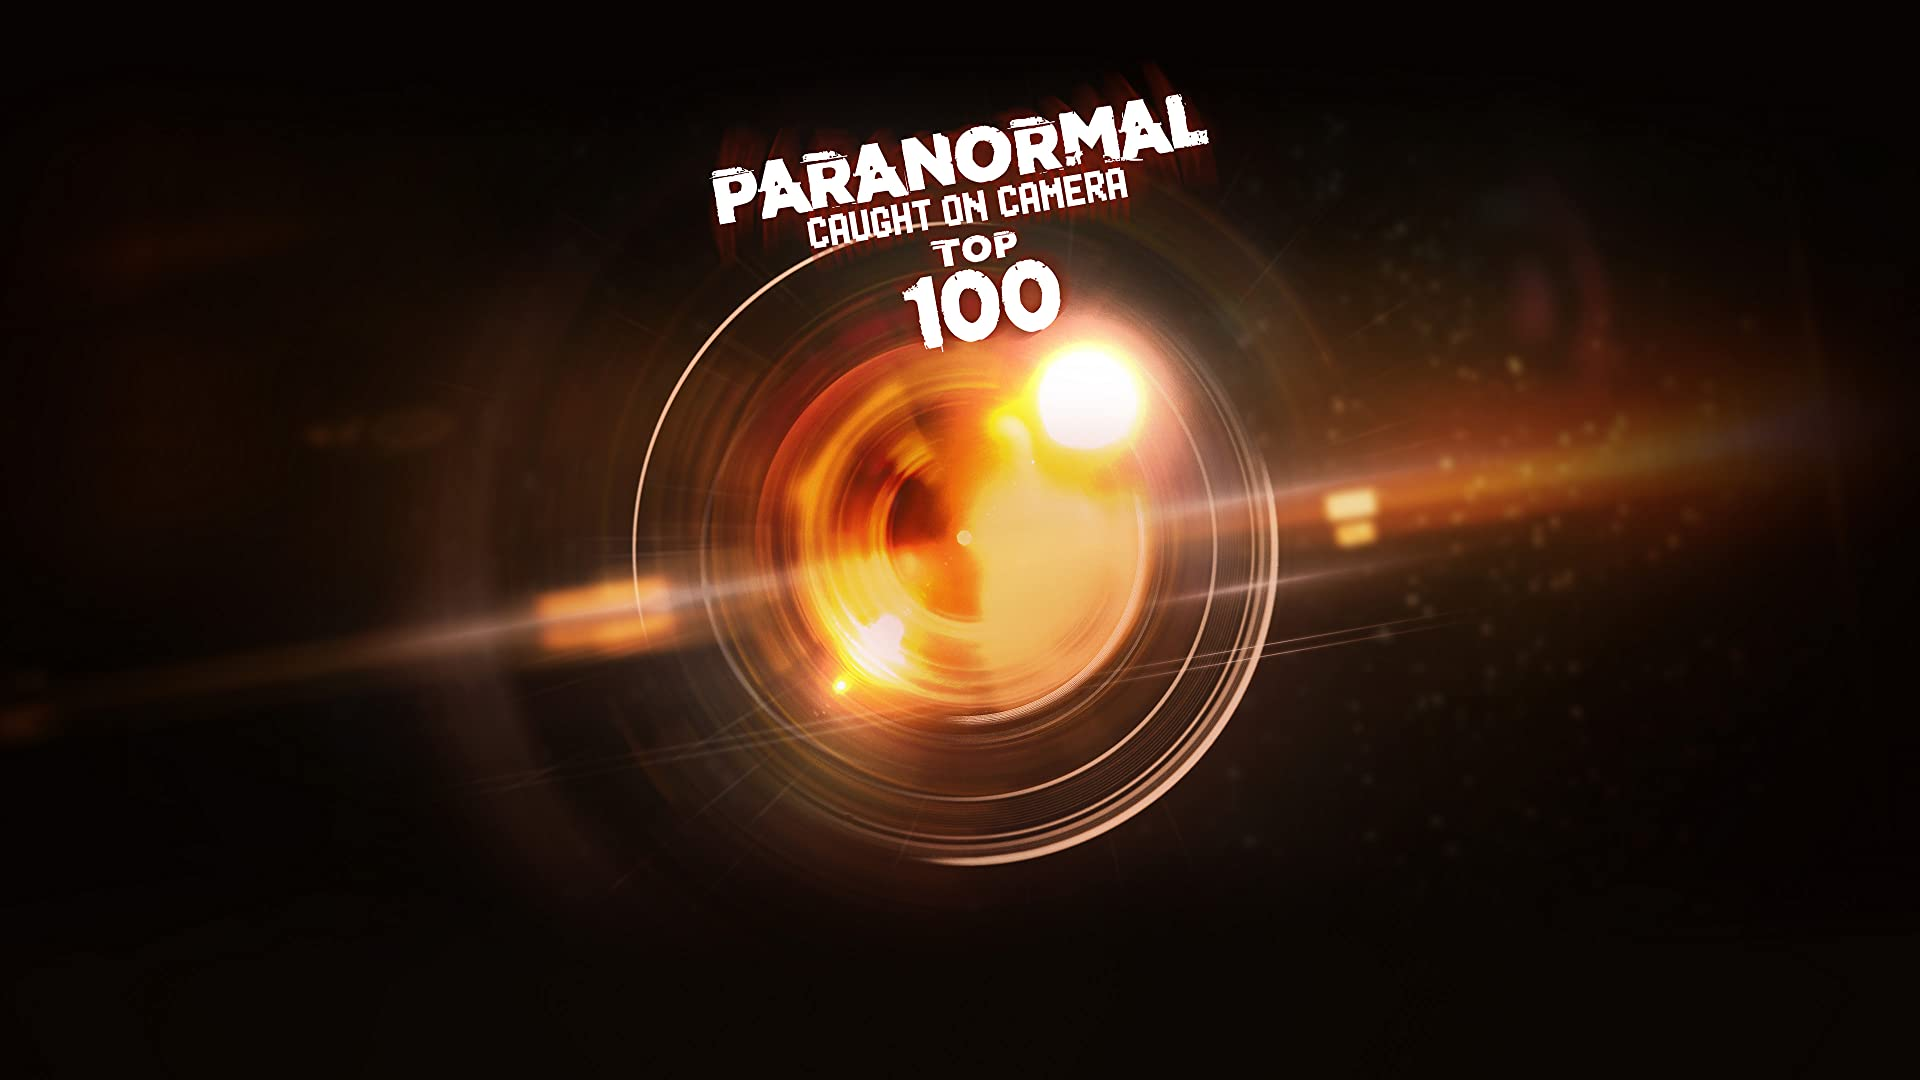 Paranormal Caught on Camera: Top 100 Countdown - Season 1